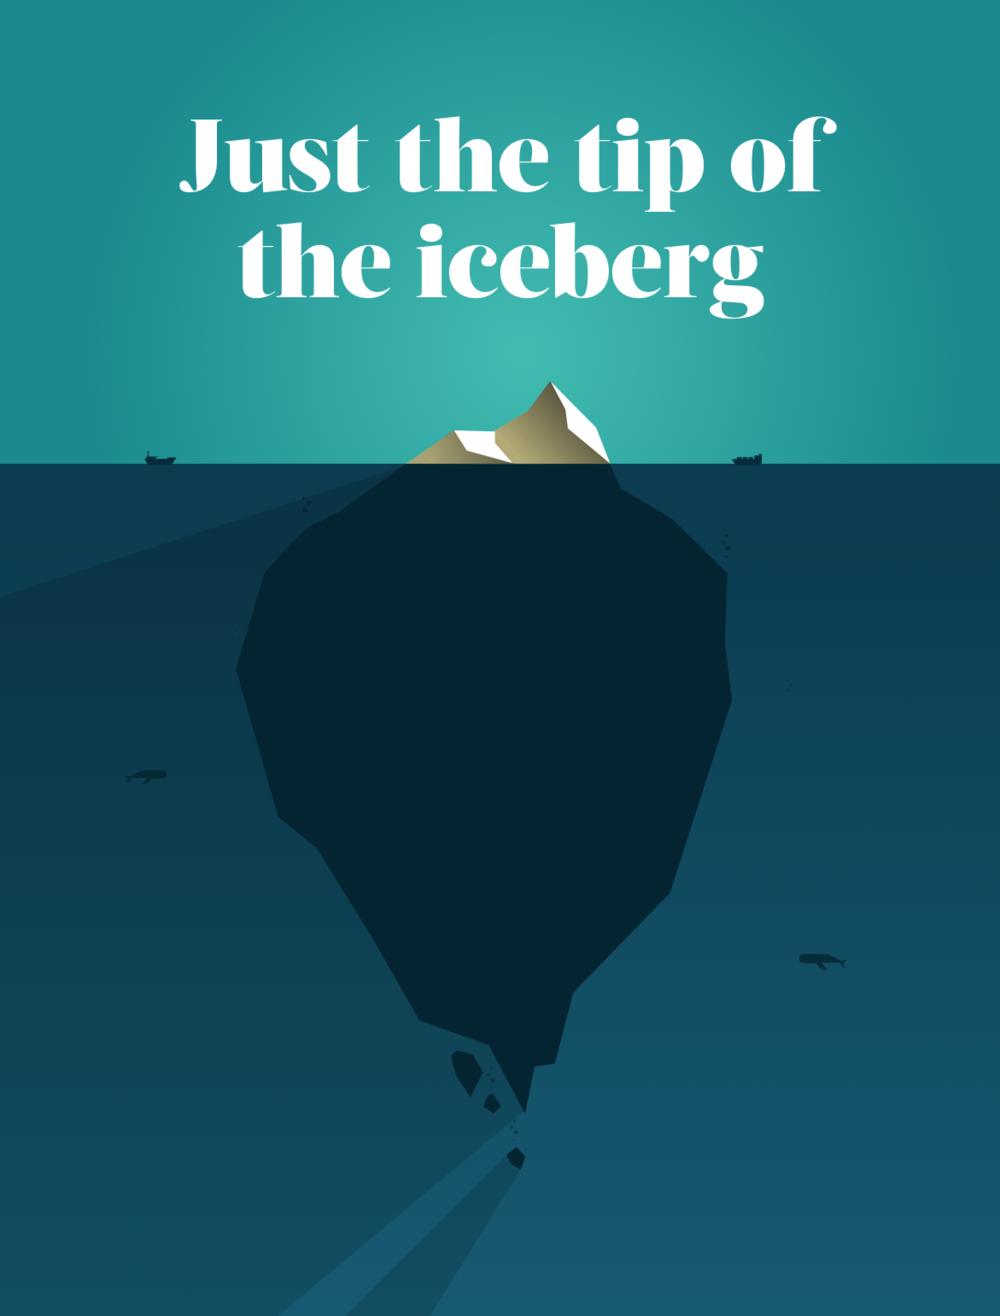 tip-iceberg-2.png